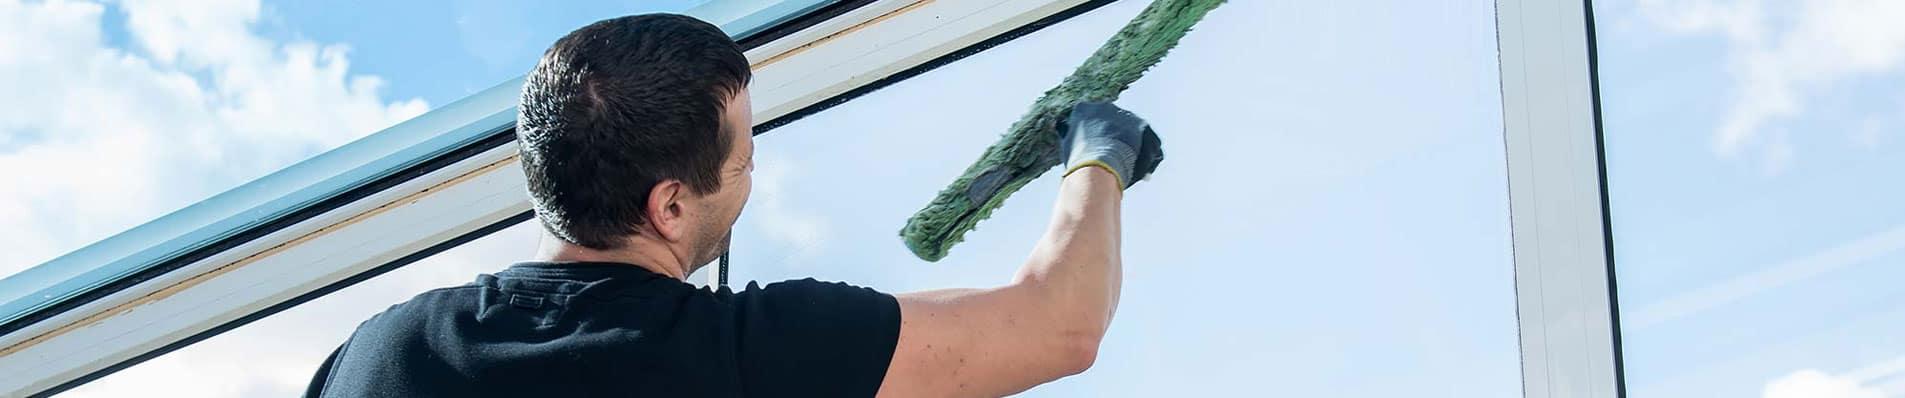 entreprise nettoyage vitre paris - starsnett services